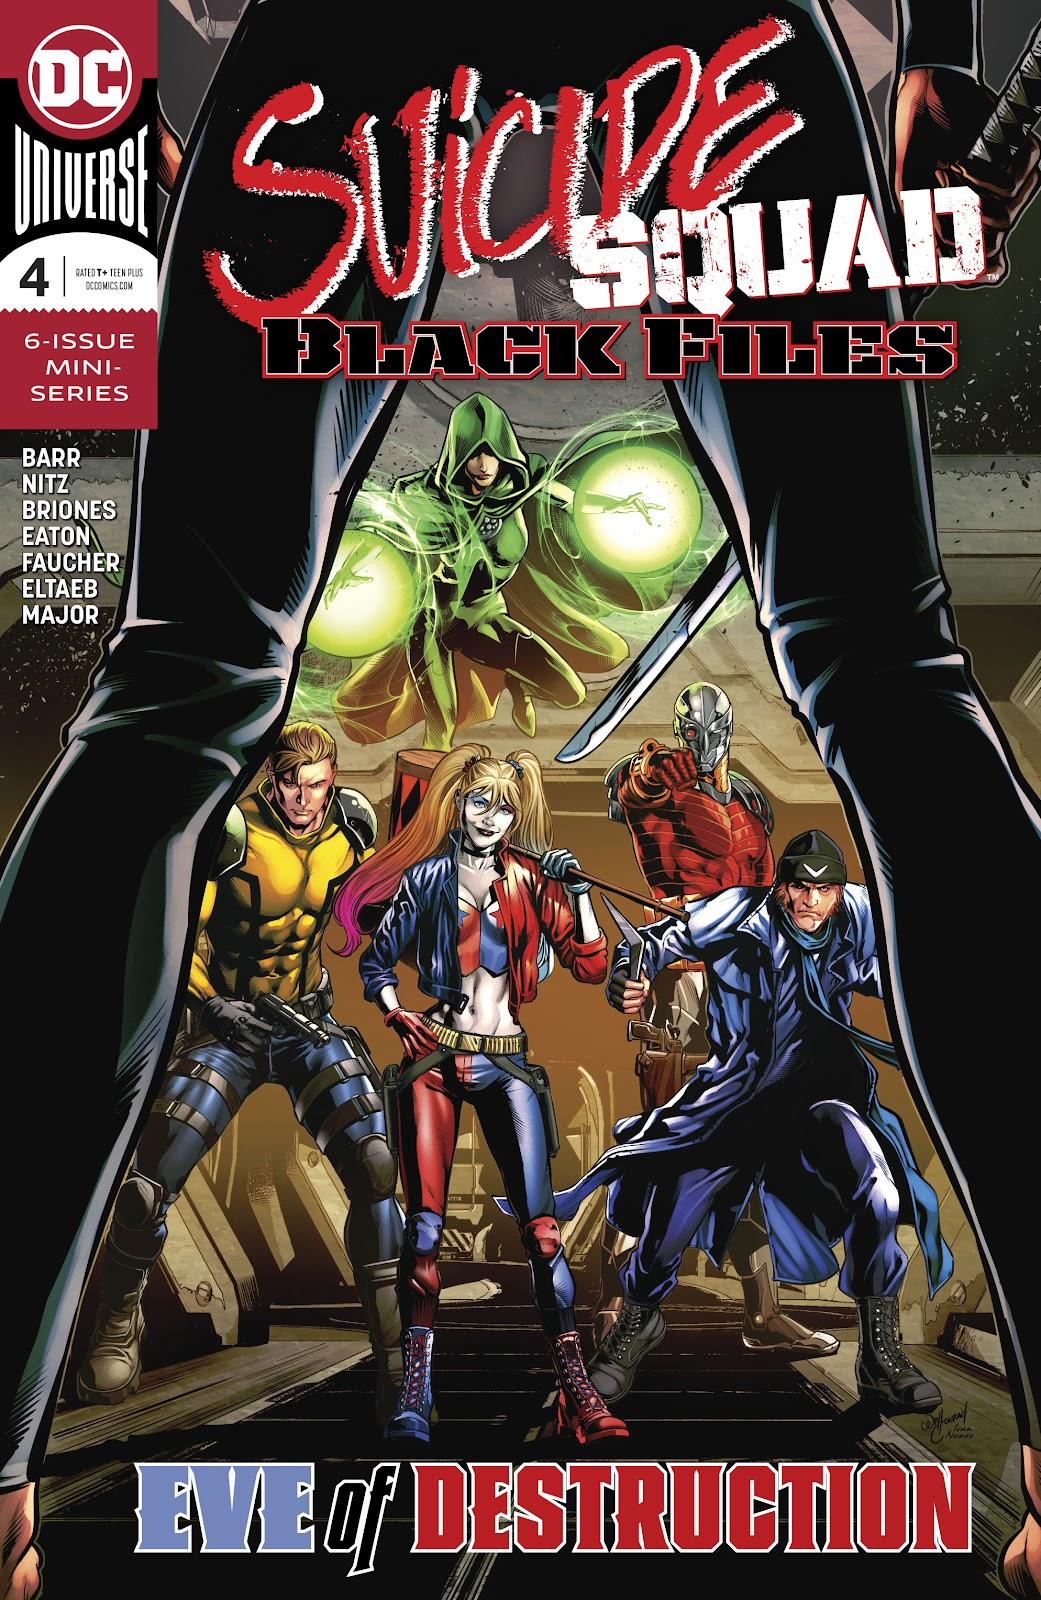 Read online Suicide Squad Black Files comic -  Issue #4 - 1